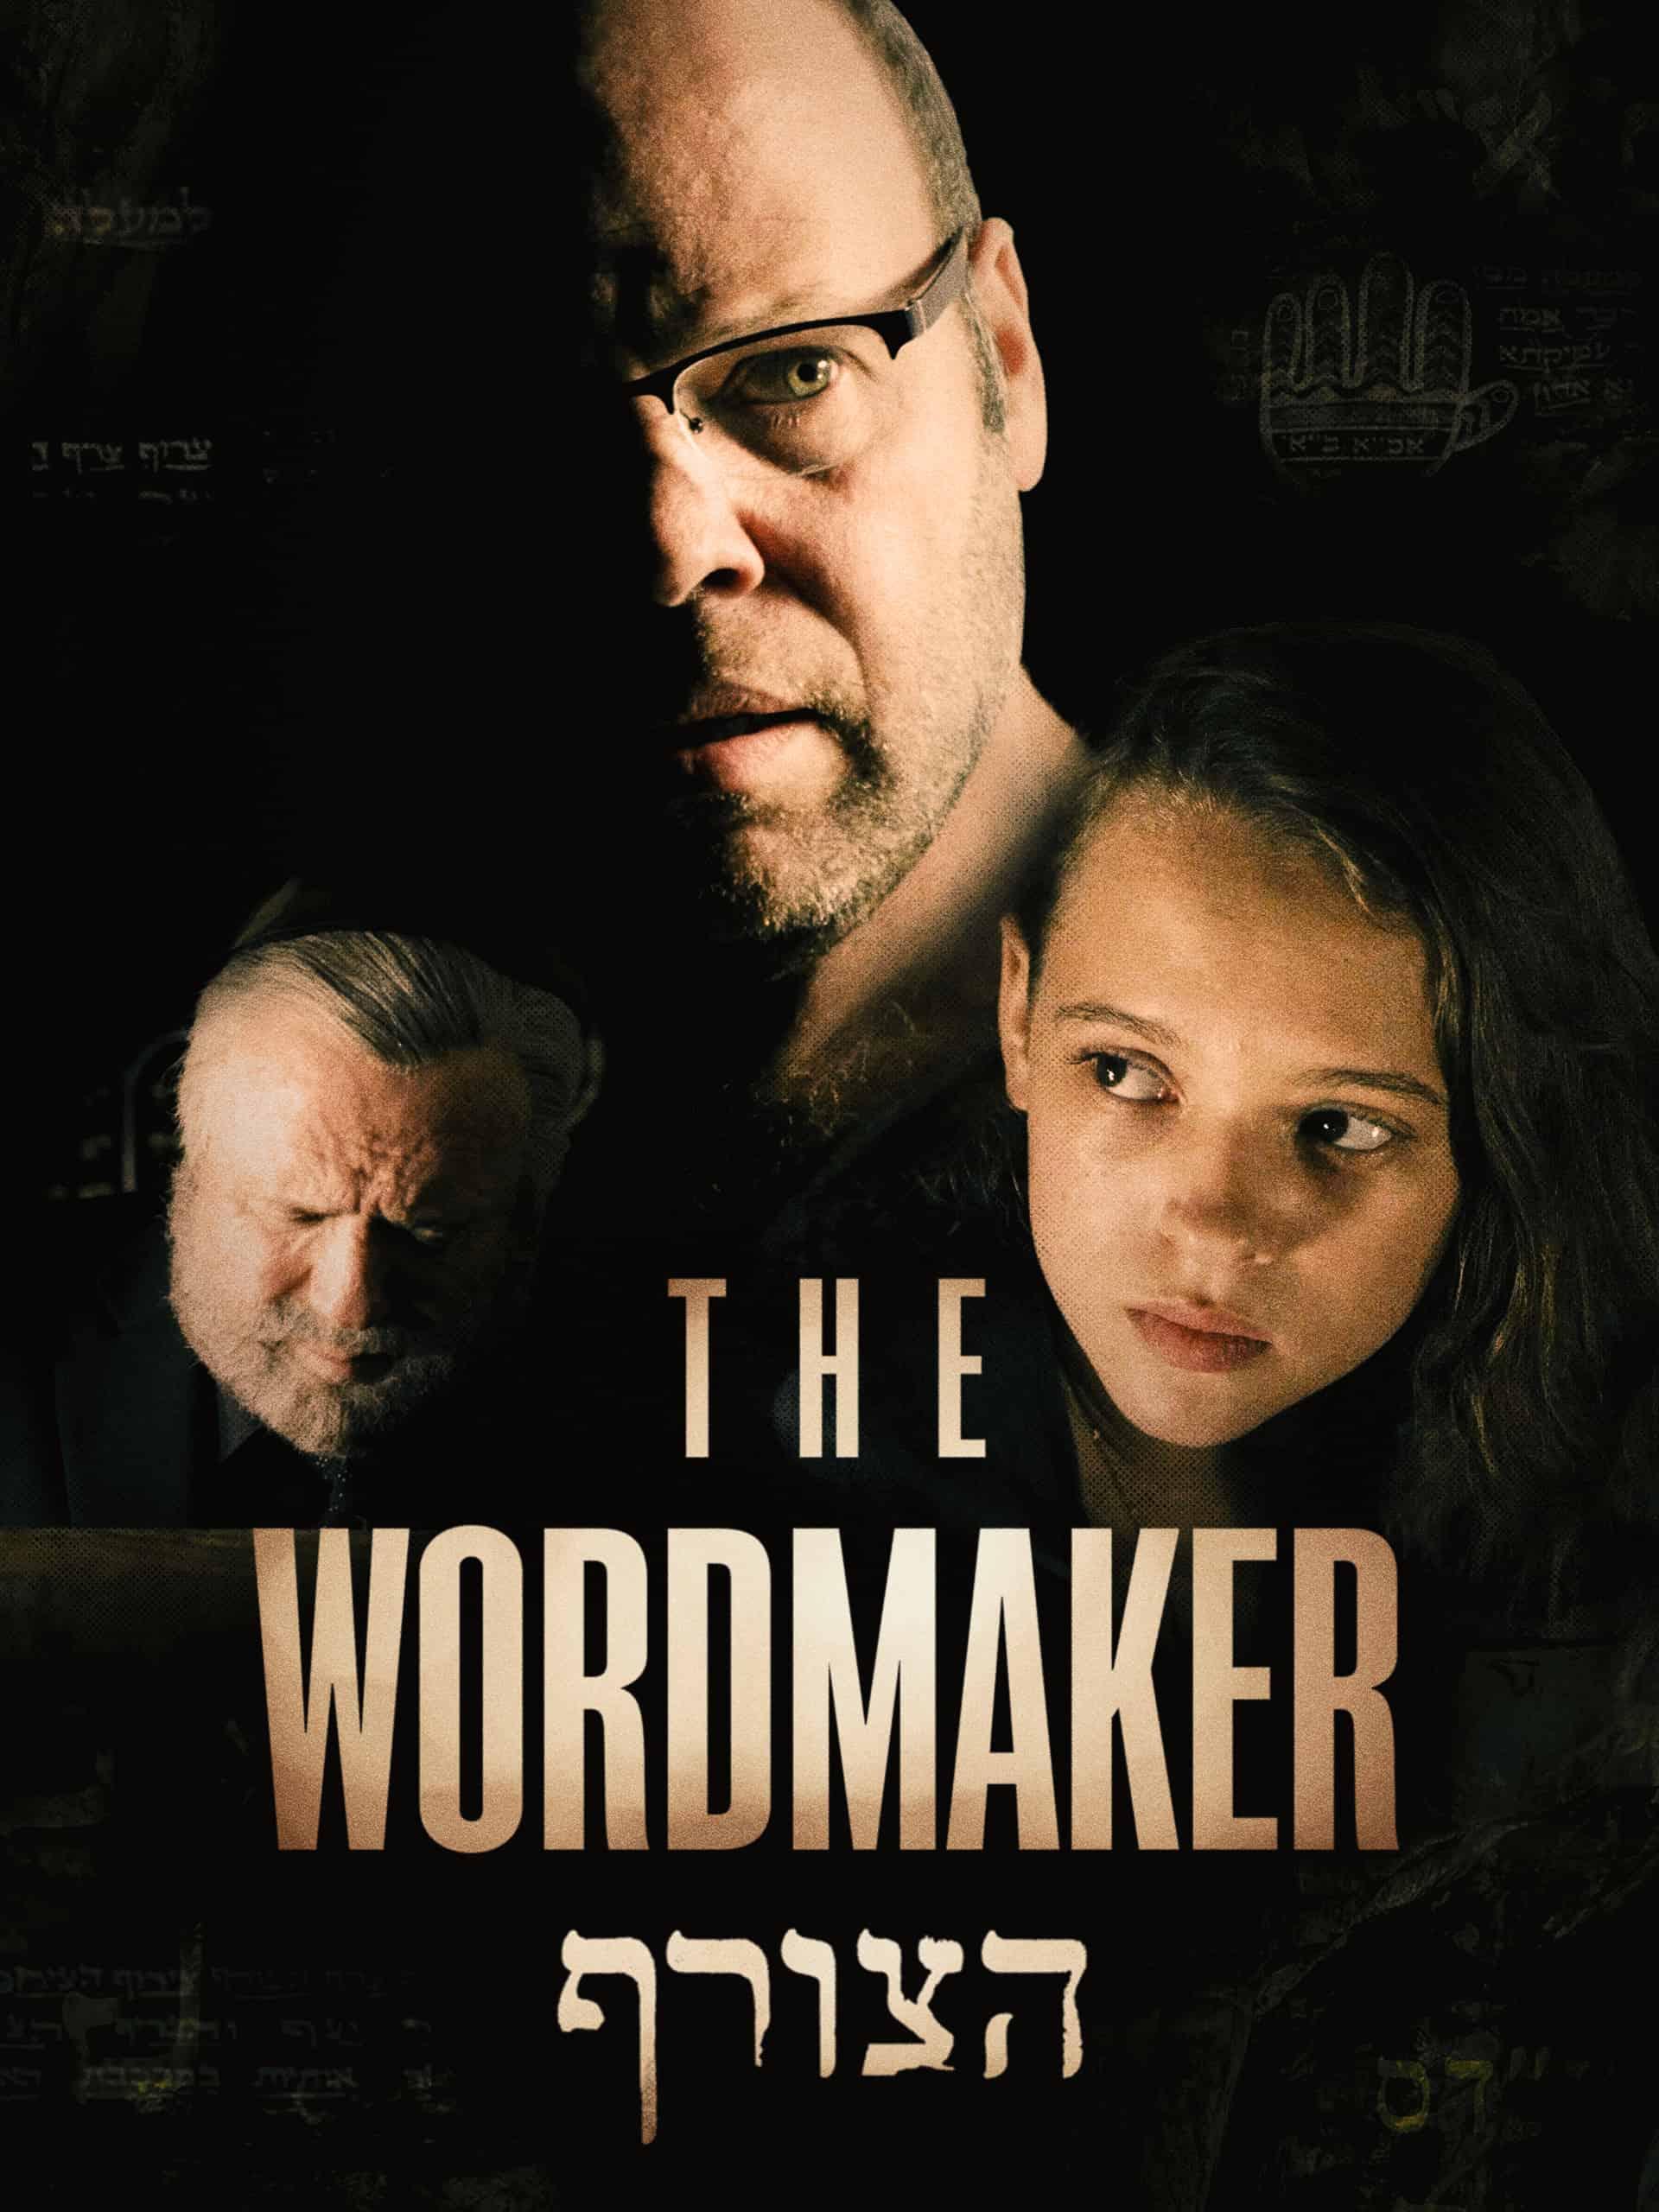 The Wordmaker Stream Topic